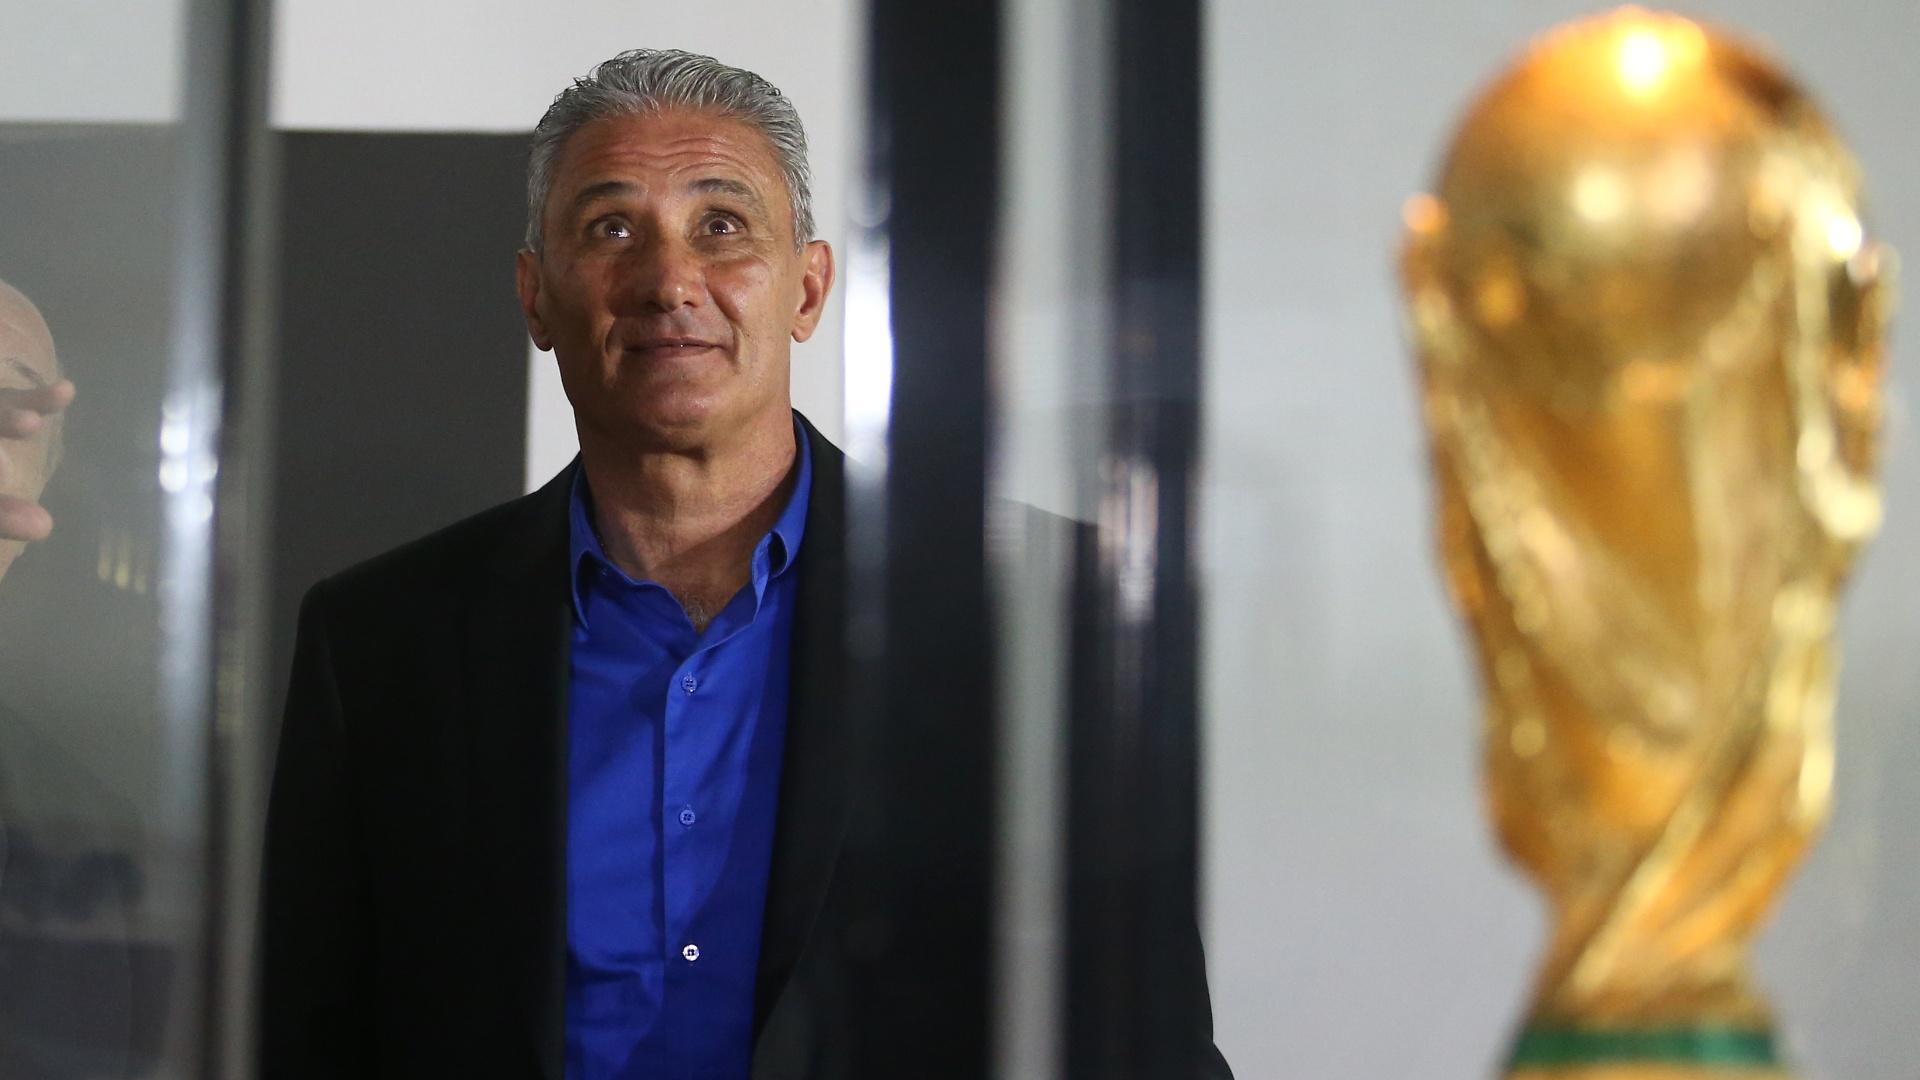 Perto da taça da Copa do Mundo, Tite visita o museu da CBF